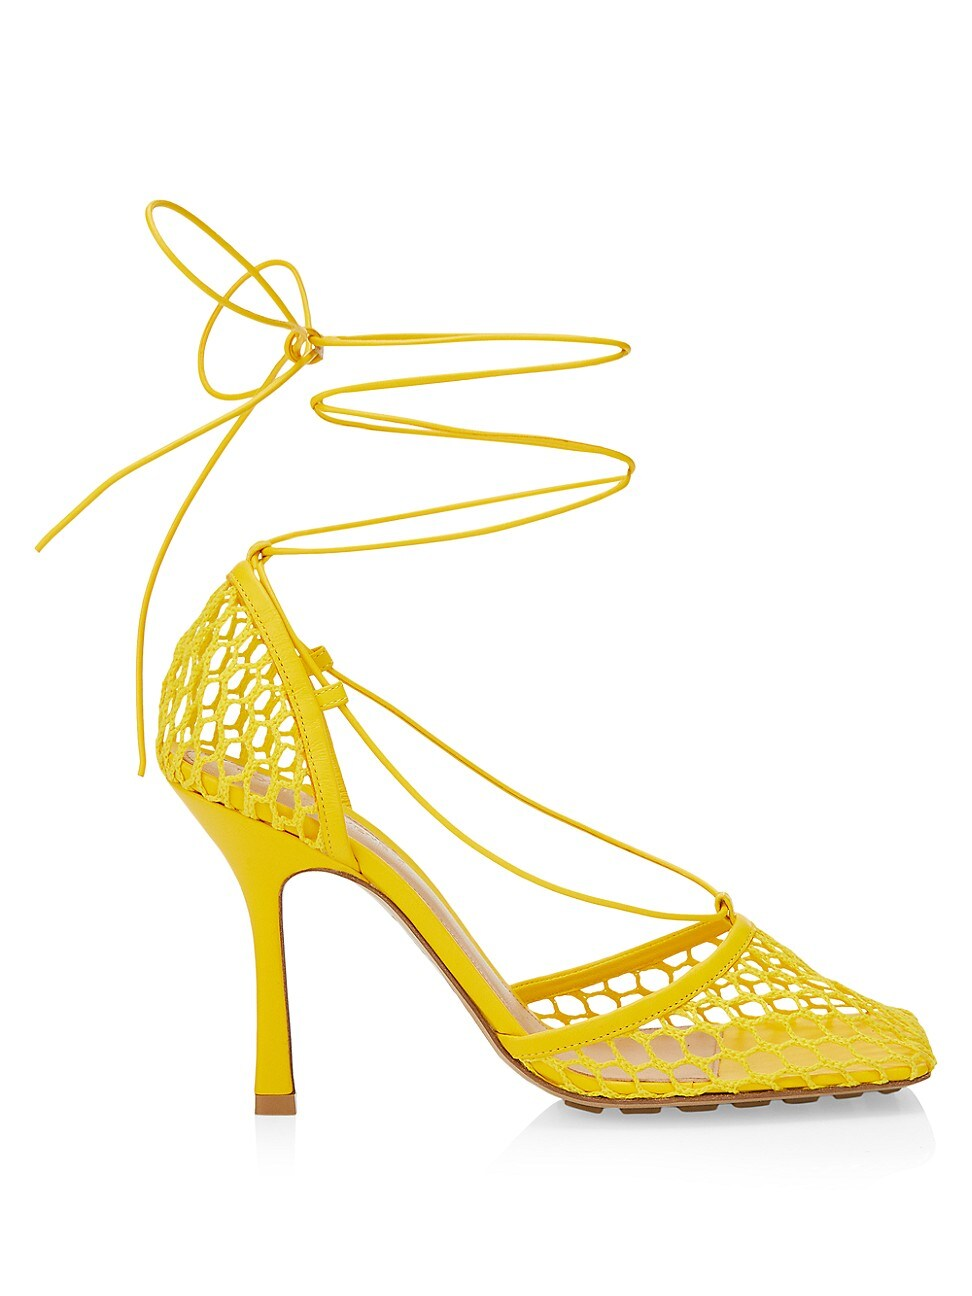 Bottega Veneta High heels WOMEN'S STRETCH SQUARE-TOE ANKLE-STRAP MESH PUMPS